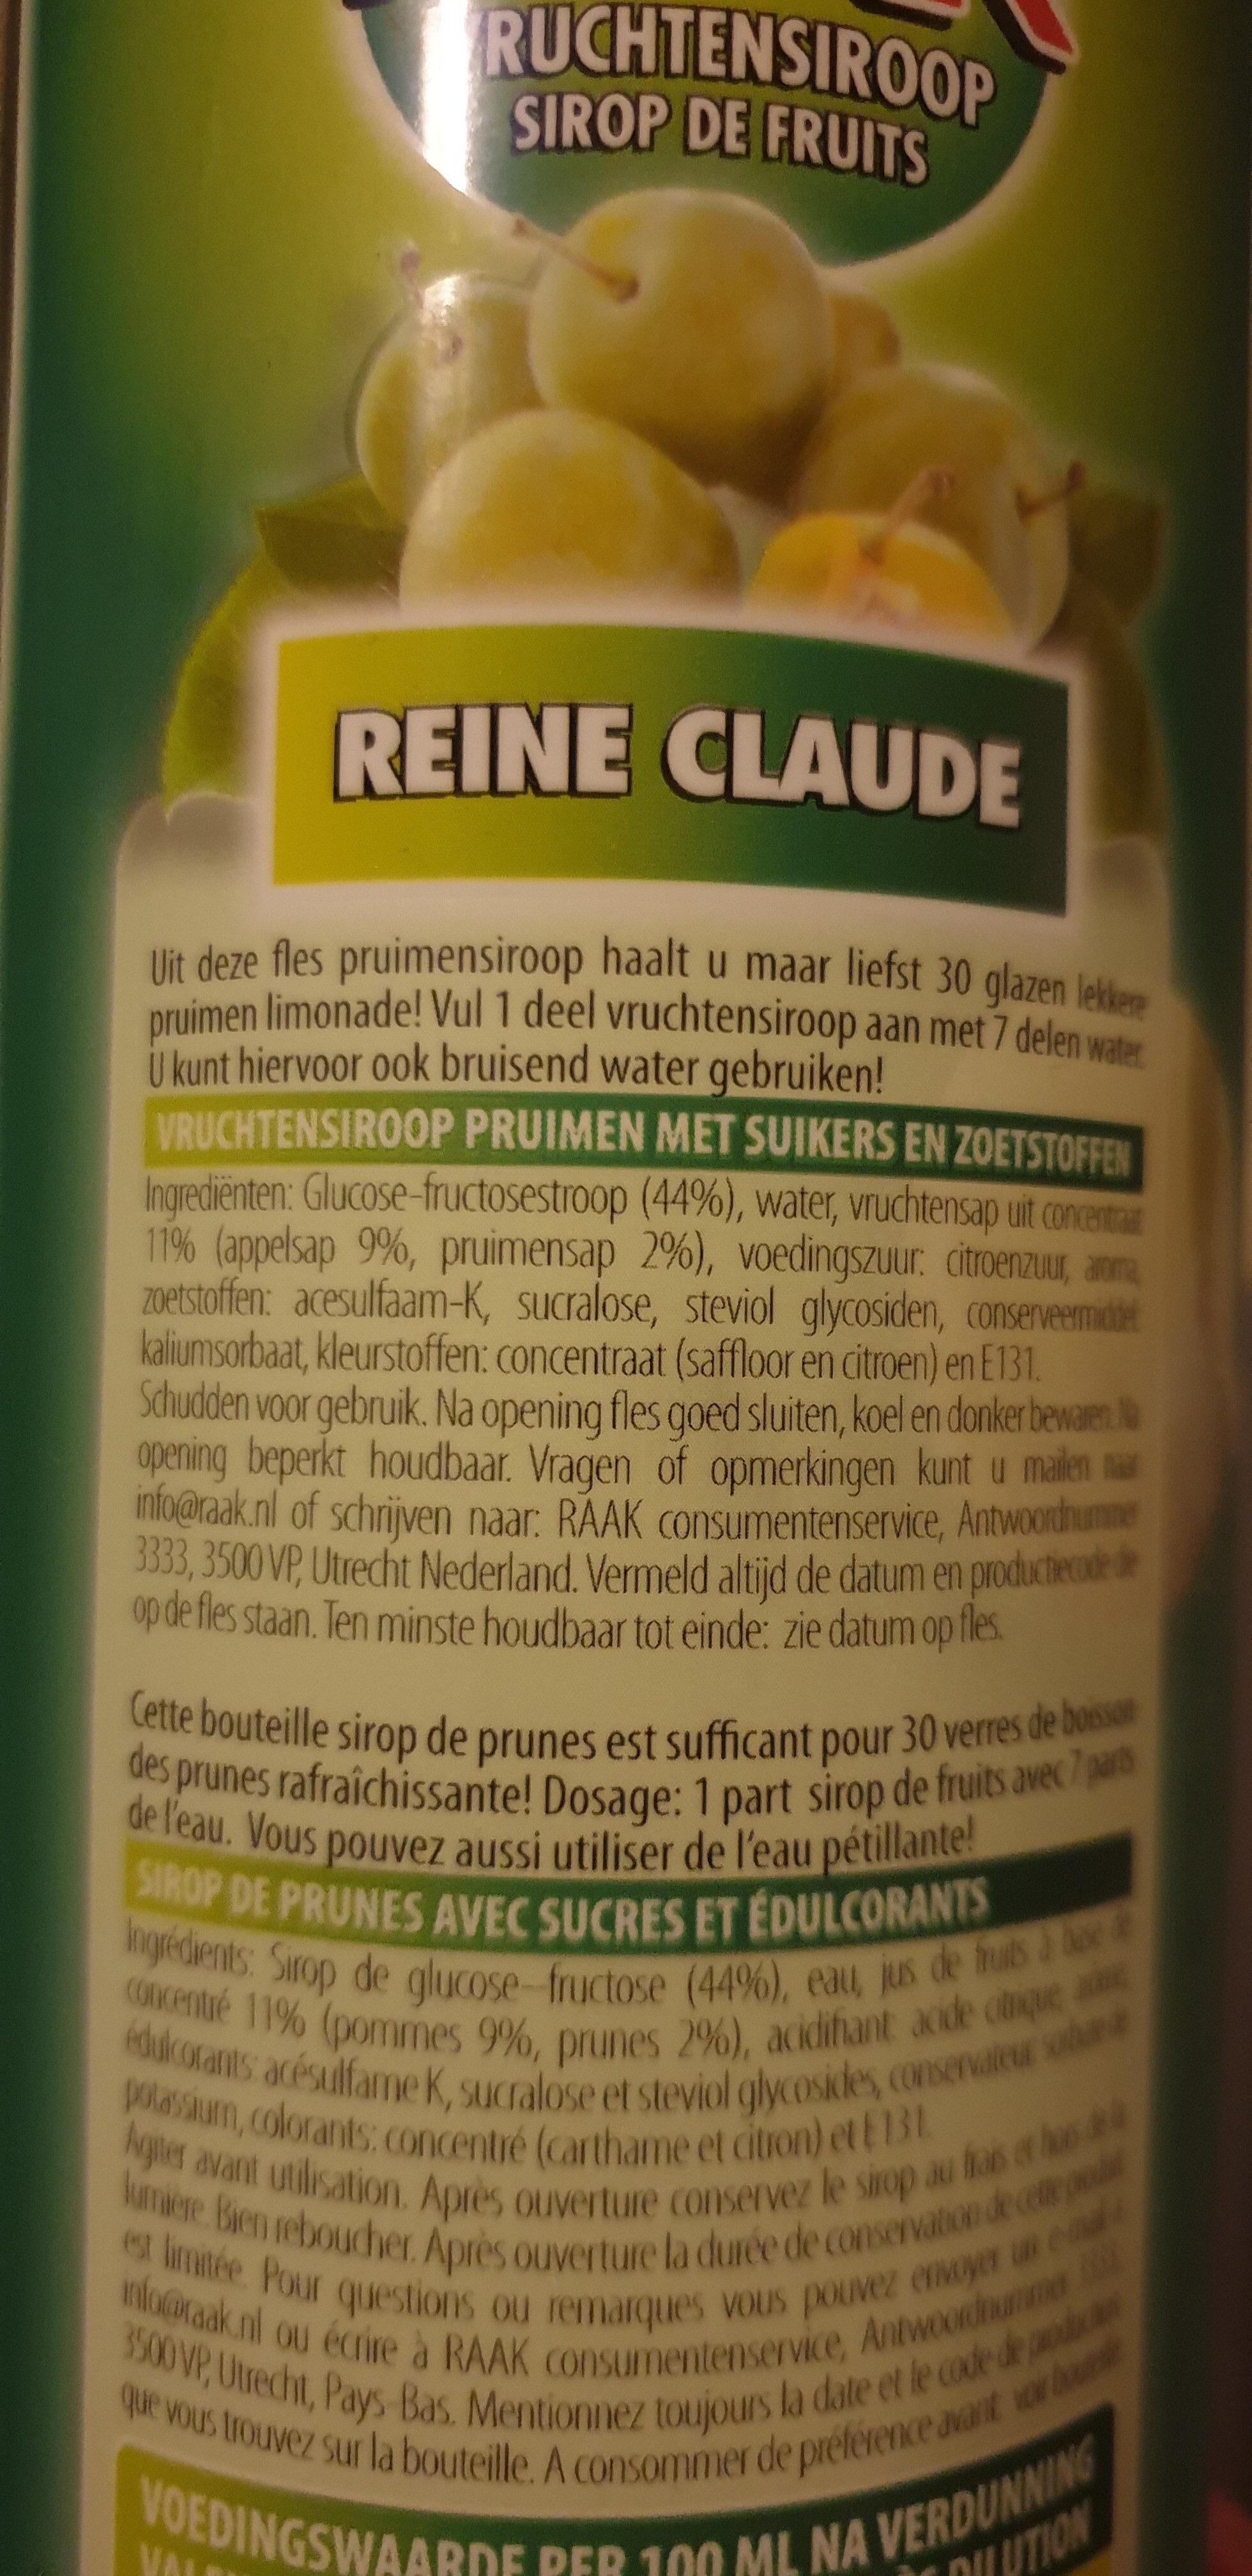 Raak Vruchtensiroop Reine Claude - Product